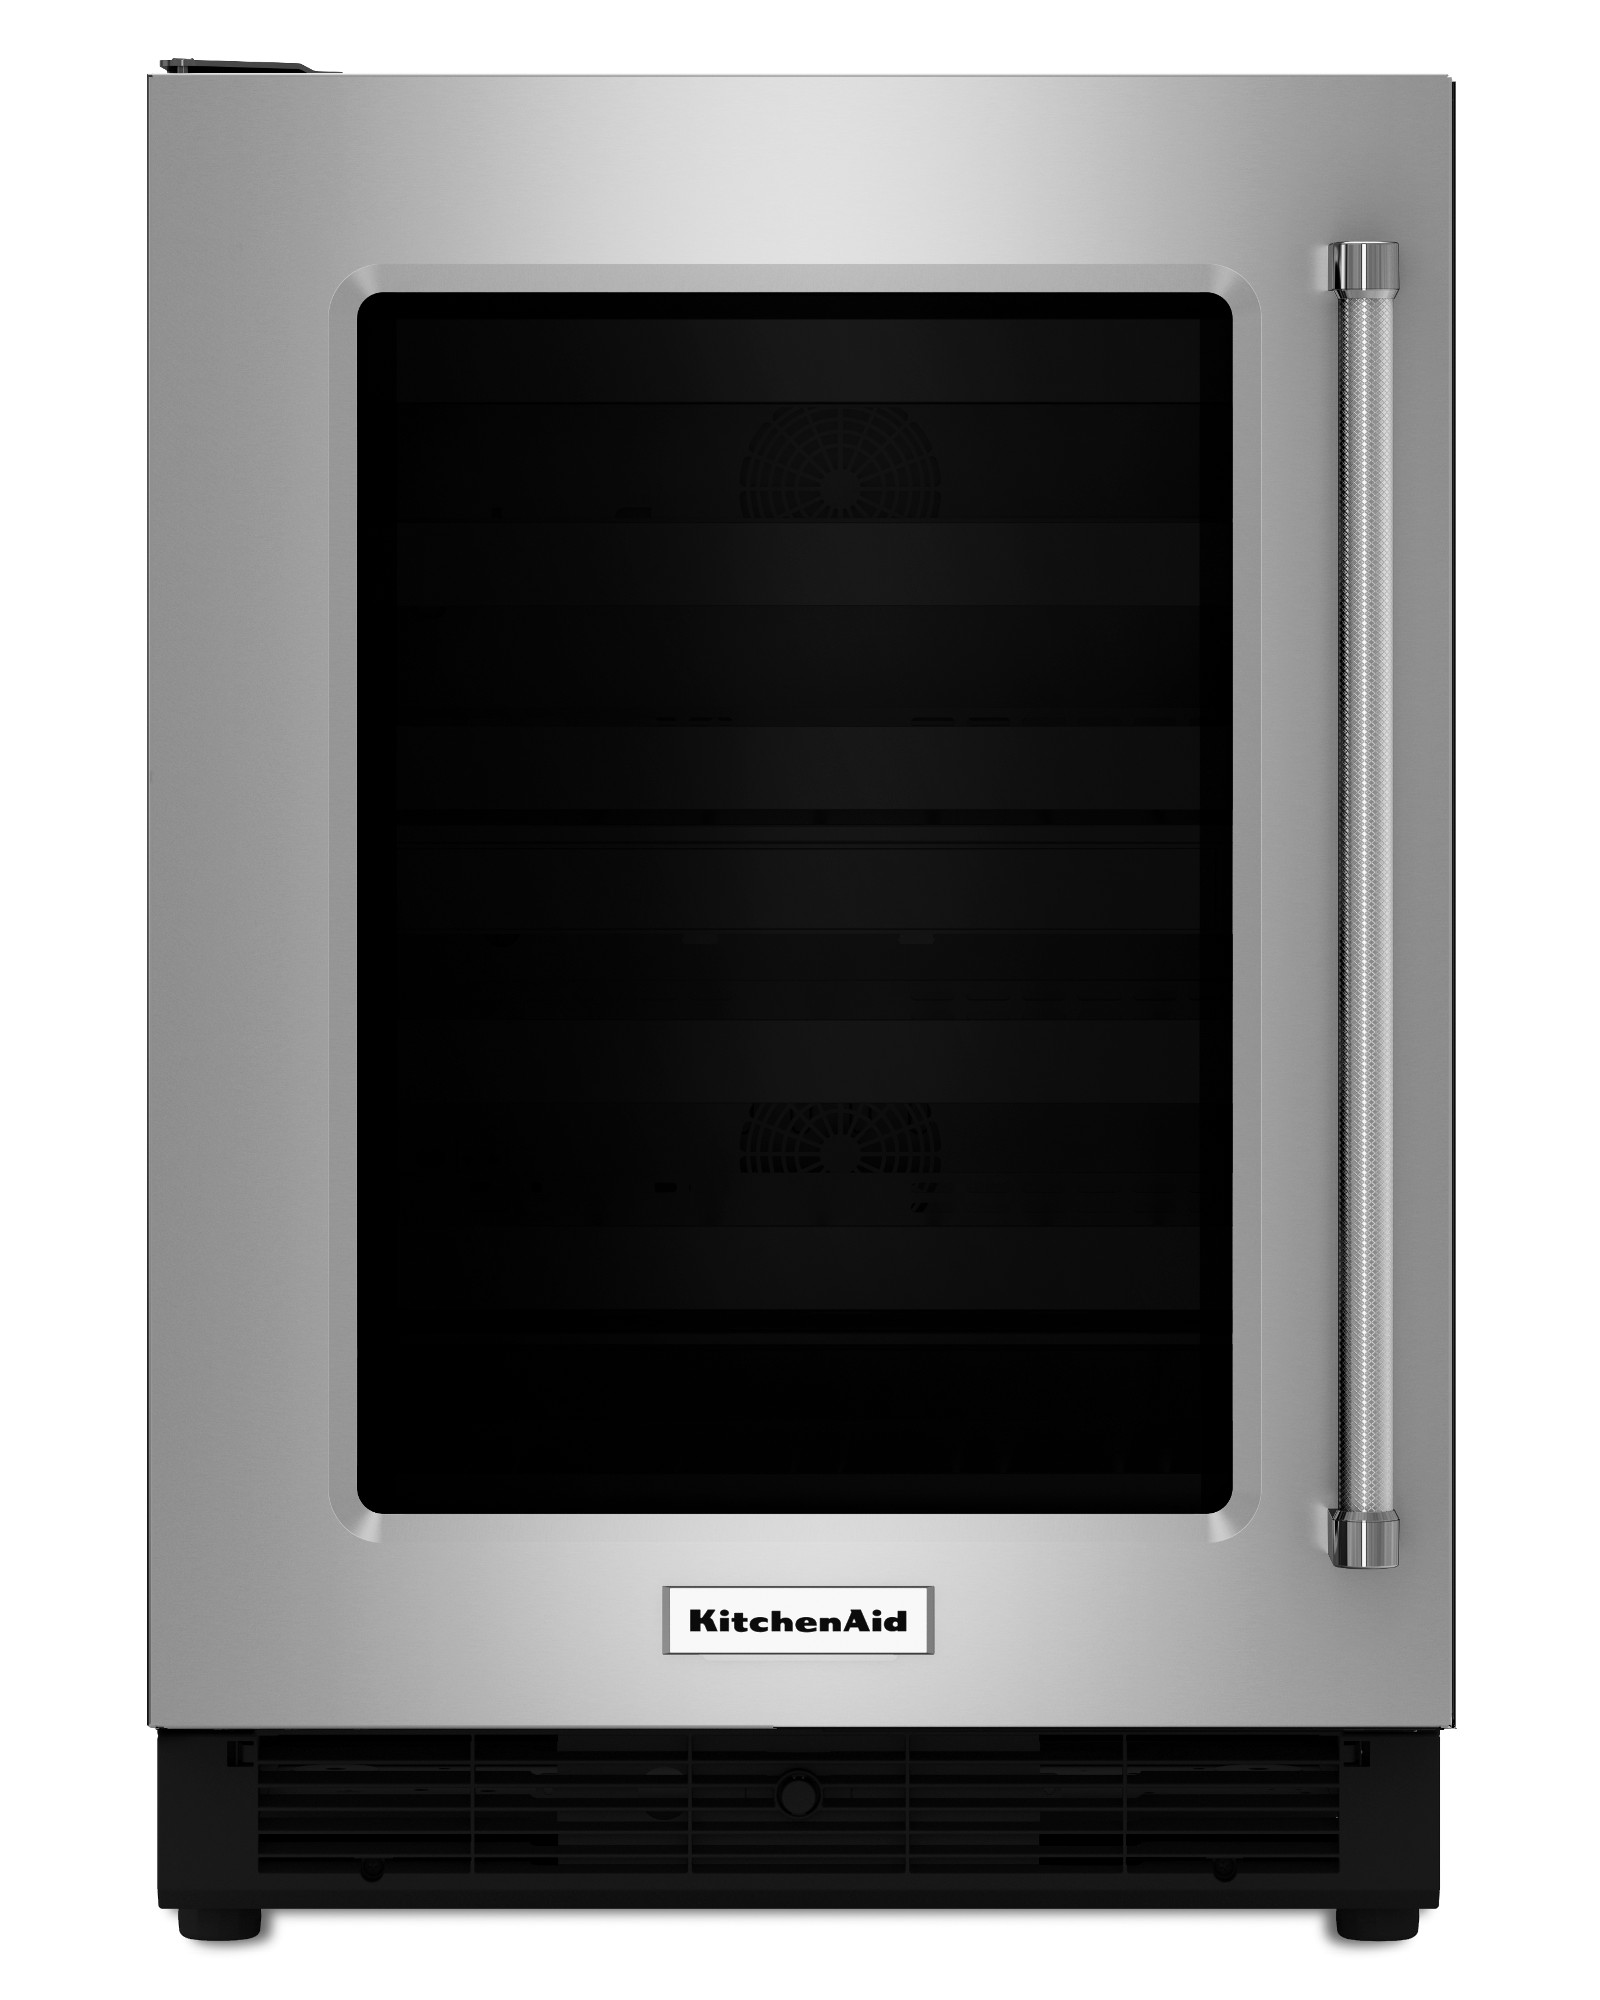 KURL204ESB-5-1-cu-ft-Left-Swing-Undercounter-Refrigerator-w-Glass-Door-Stainless-Steel